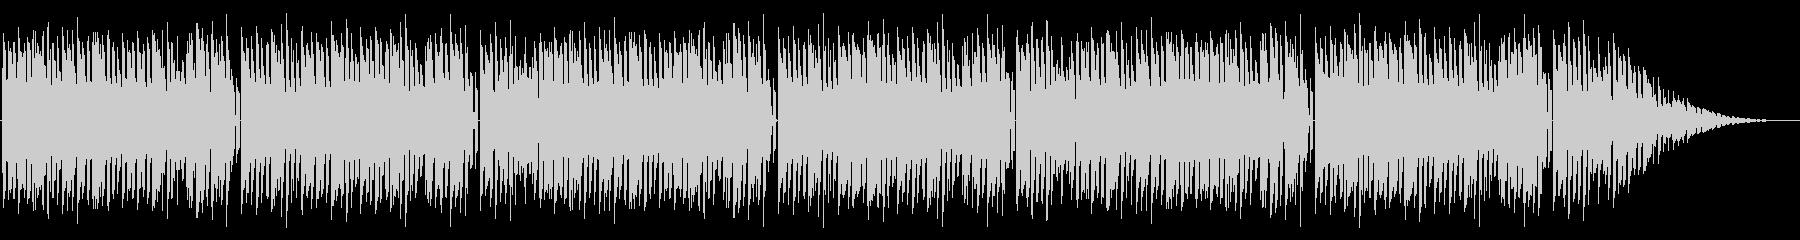 NES アクションD08-1(エンディンの未再生の波形